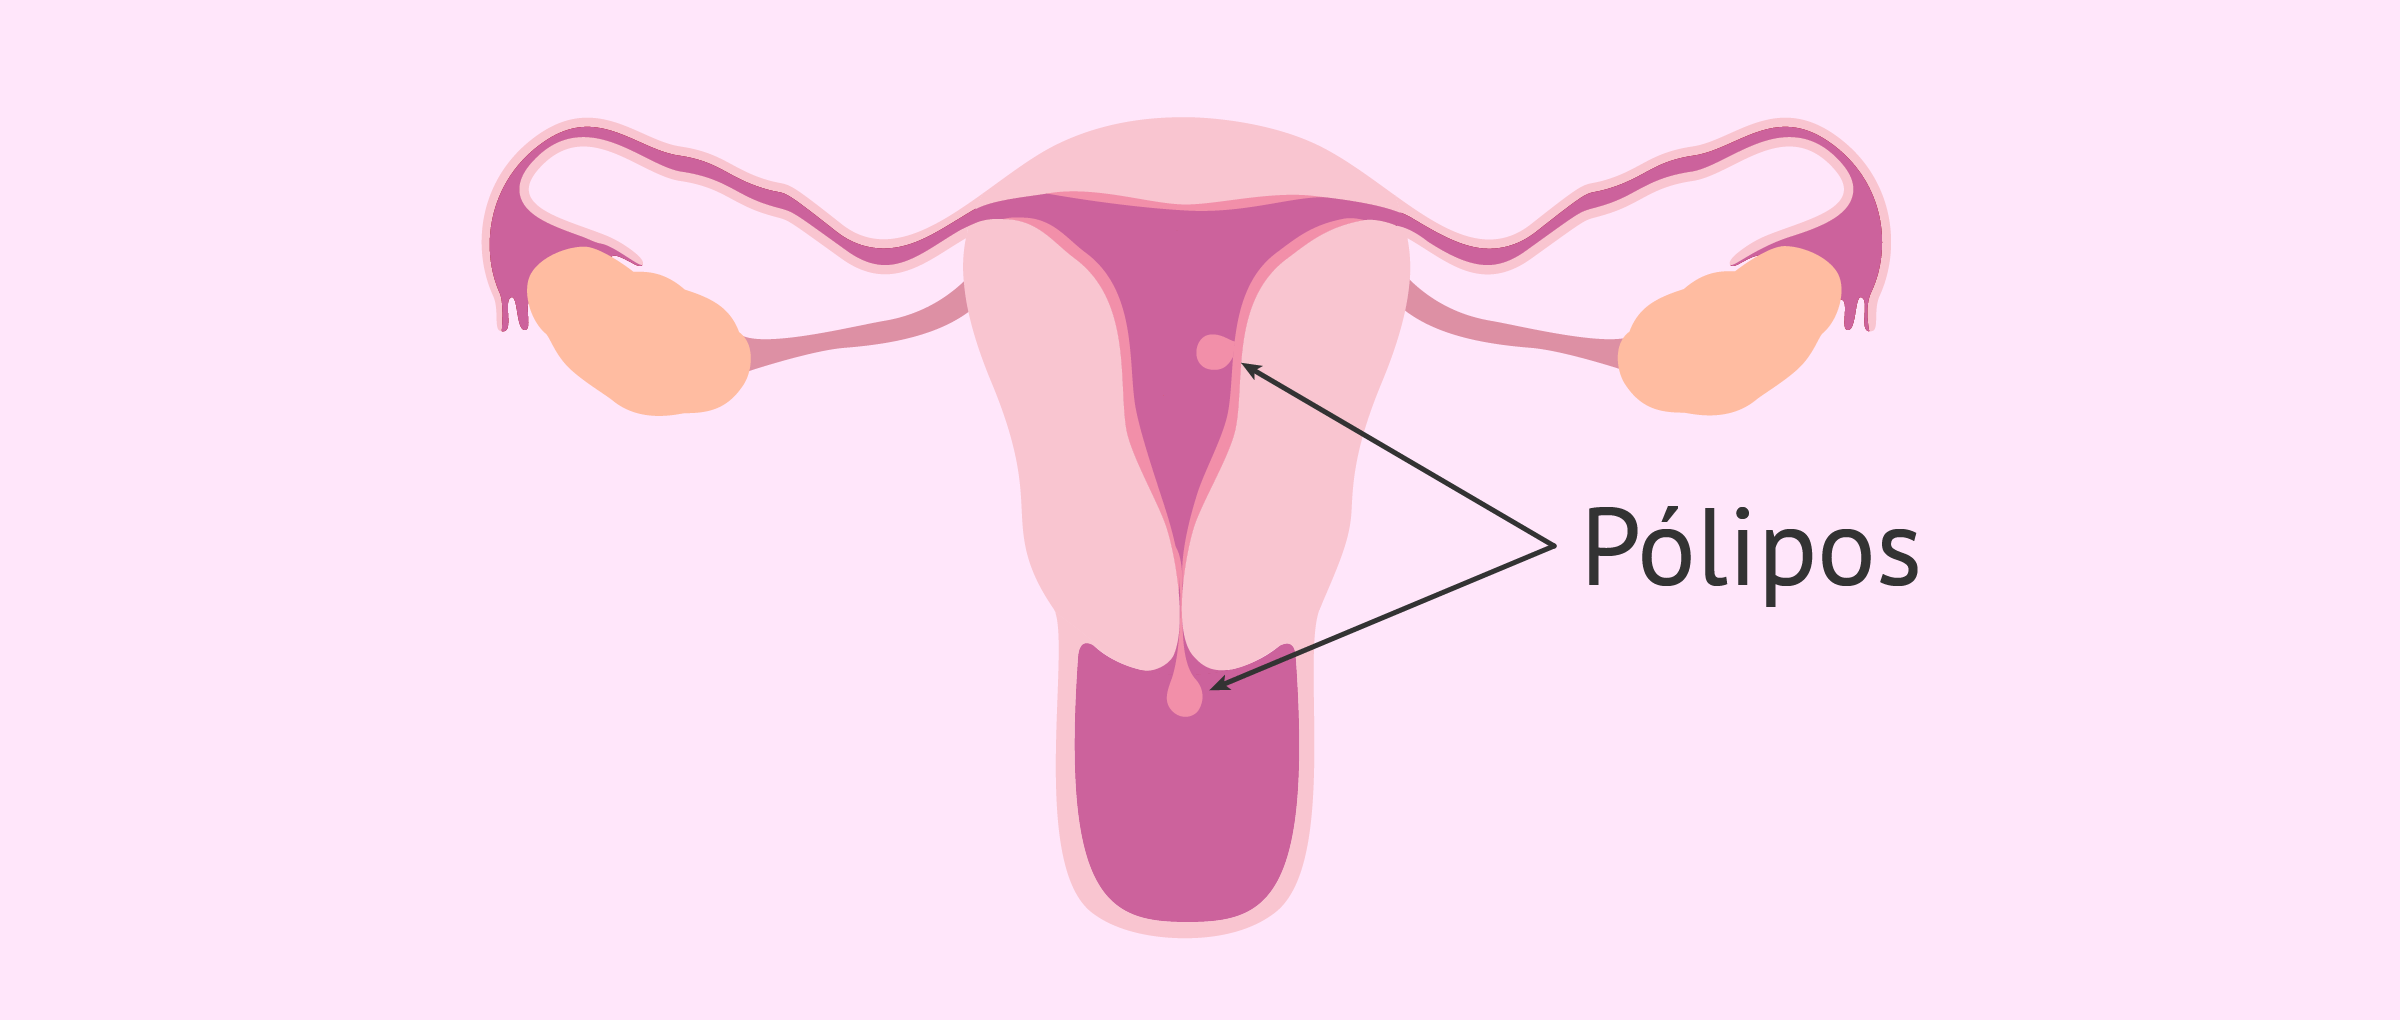 cancer endometrial mujer joven virus papiloma humano cura hombres